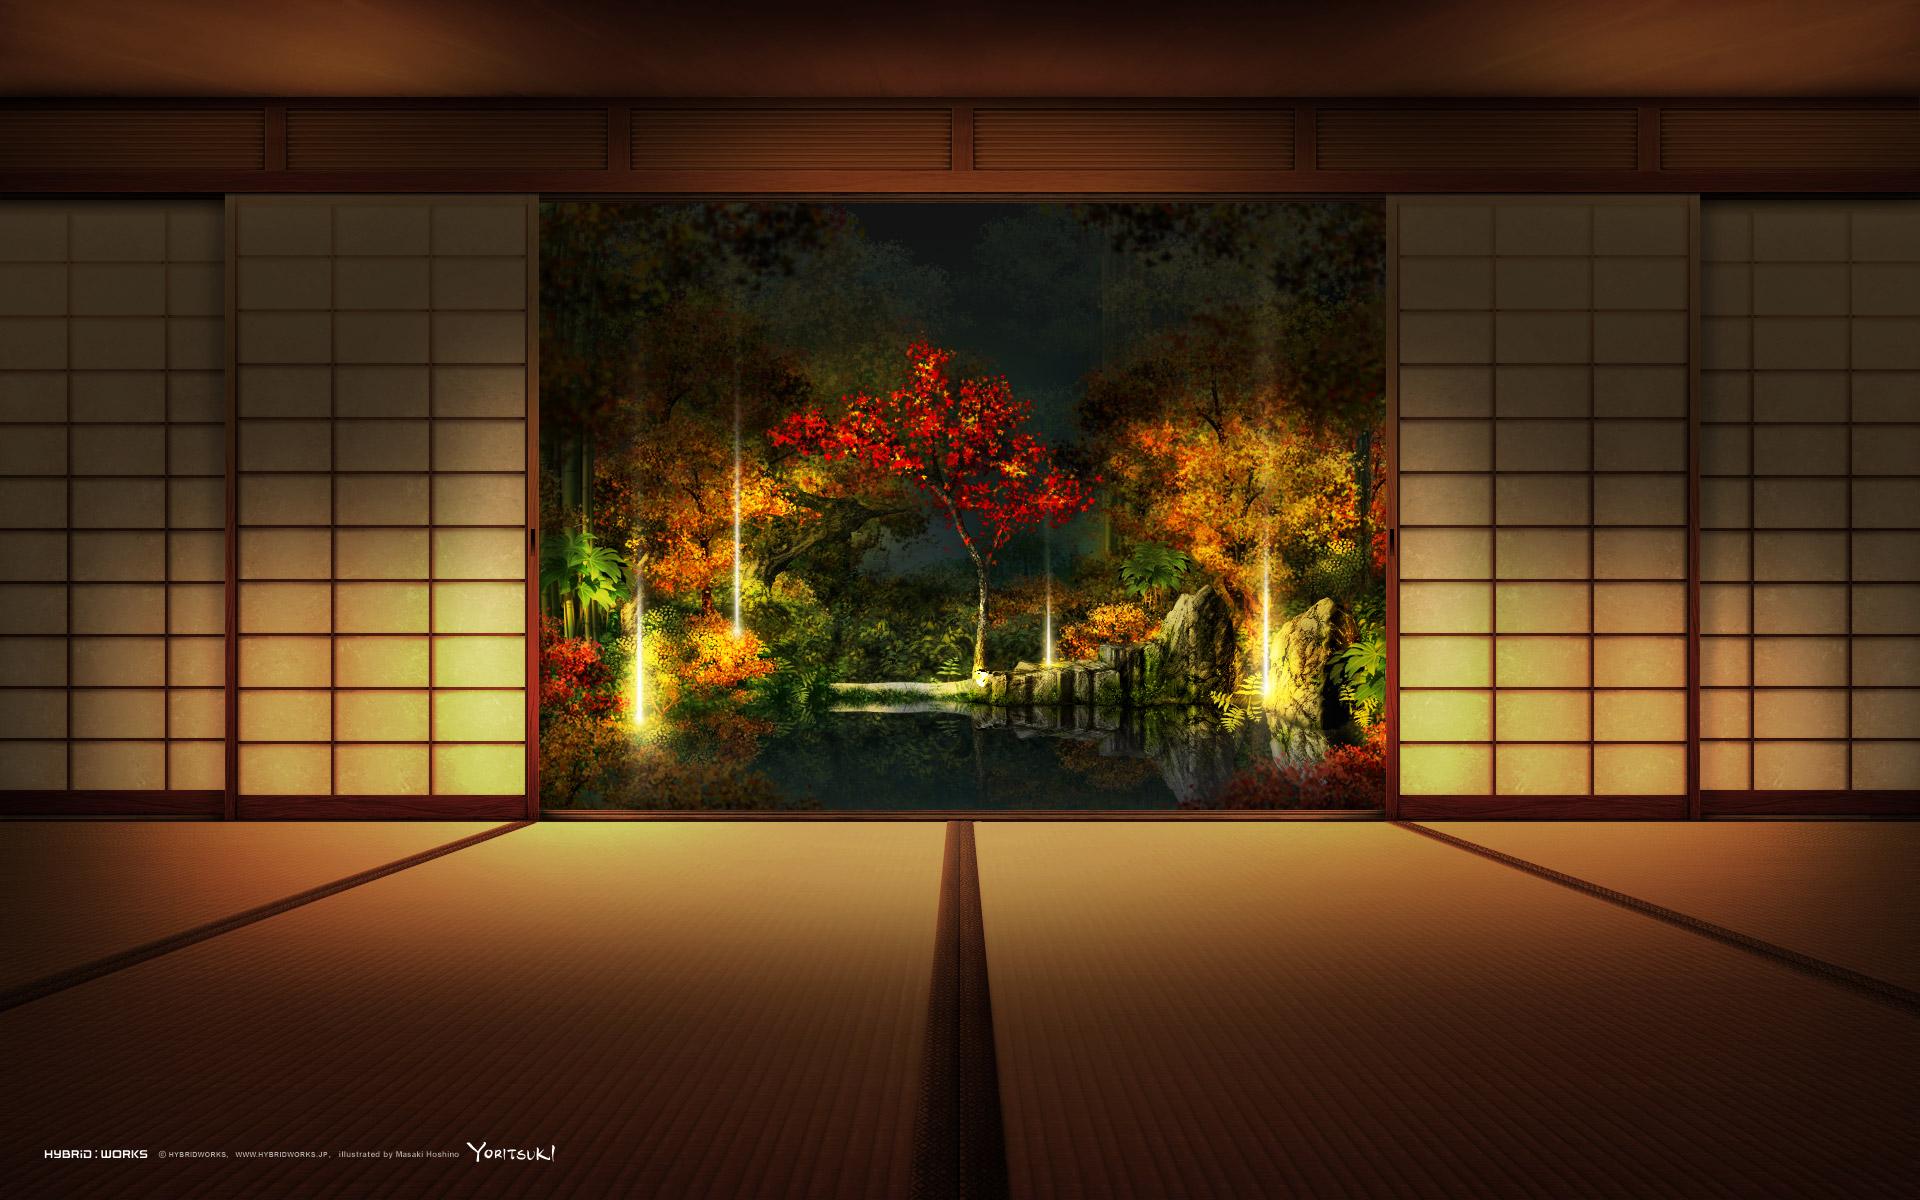 Hybridworks S Deviantart Gallery 美しすぎる 秋のデスクトップ